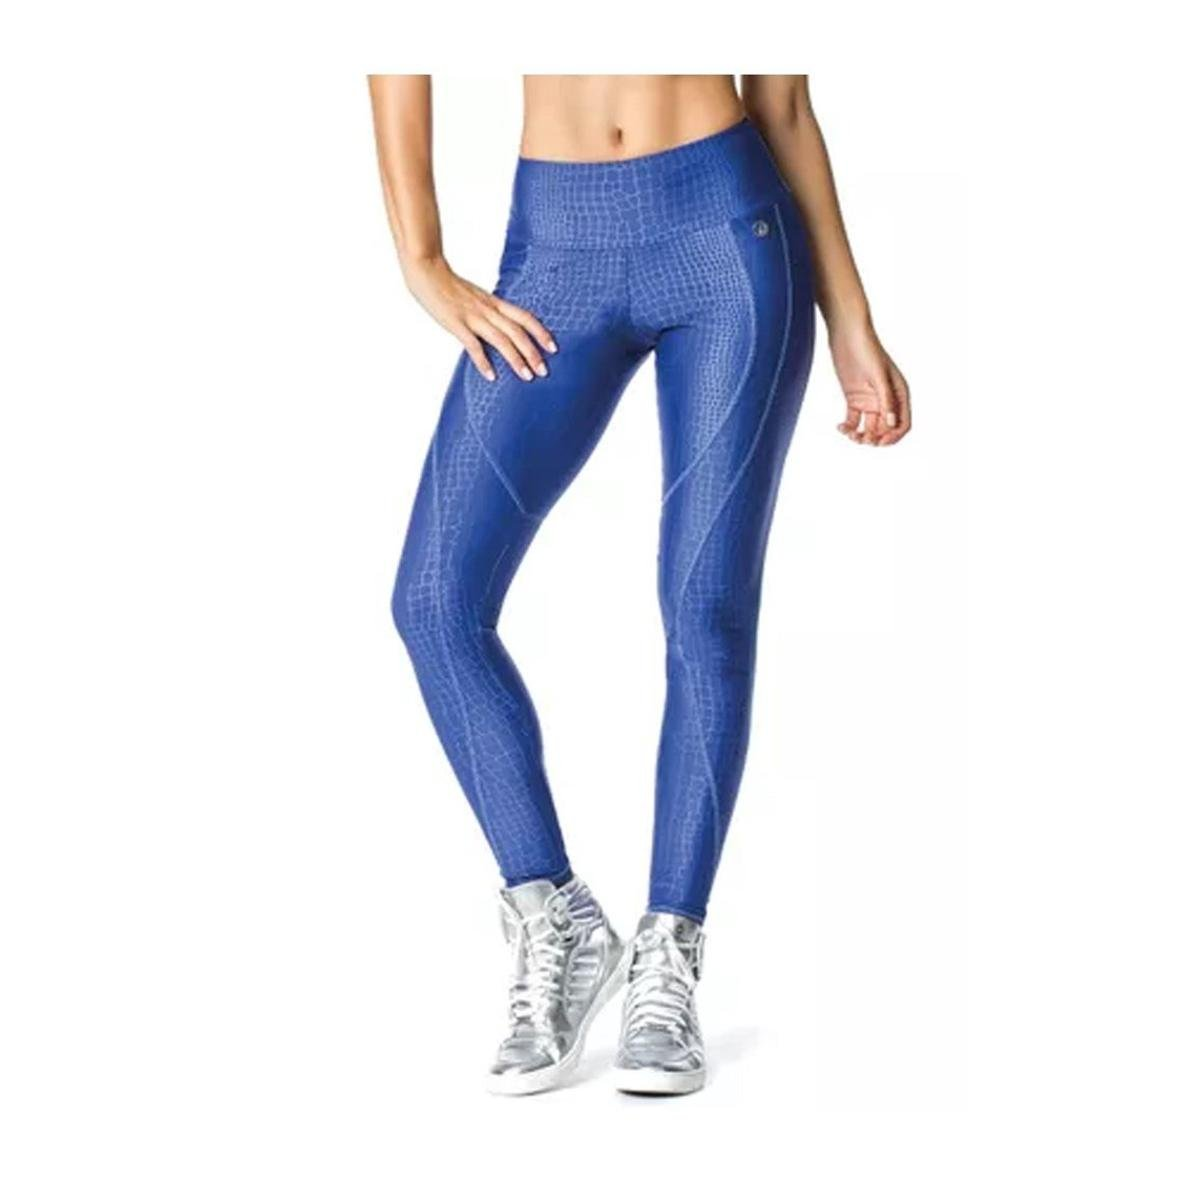 Legging Calça 482 Deluxe Jeans Jeans Fuso Calça Legging Vestem OvpnESOx